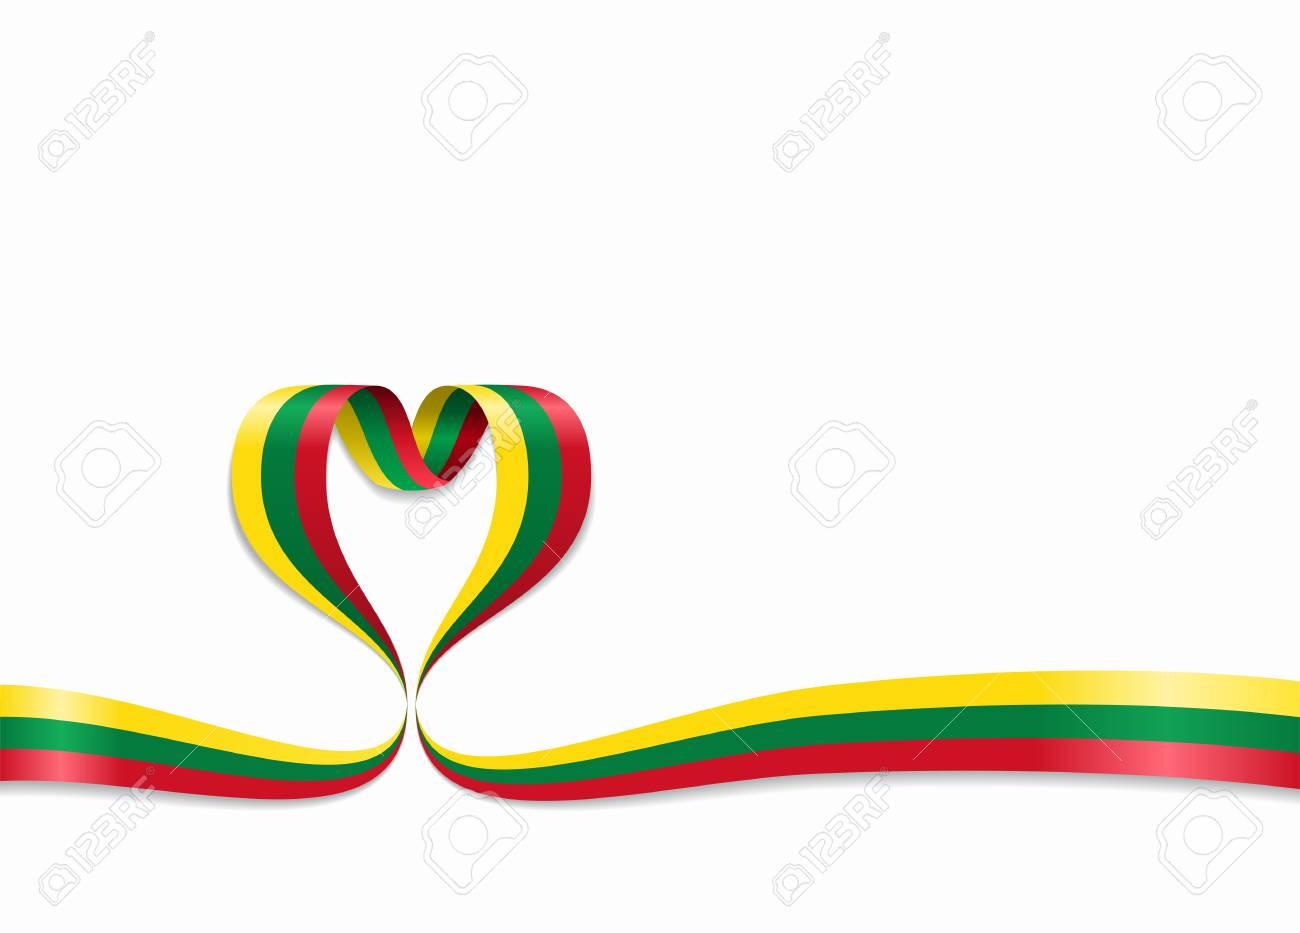 Lithuanian flag heart-shaped wavy ribbon. Vector illustration. - 100973529